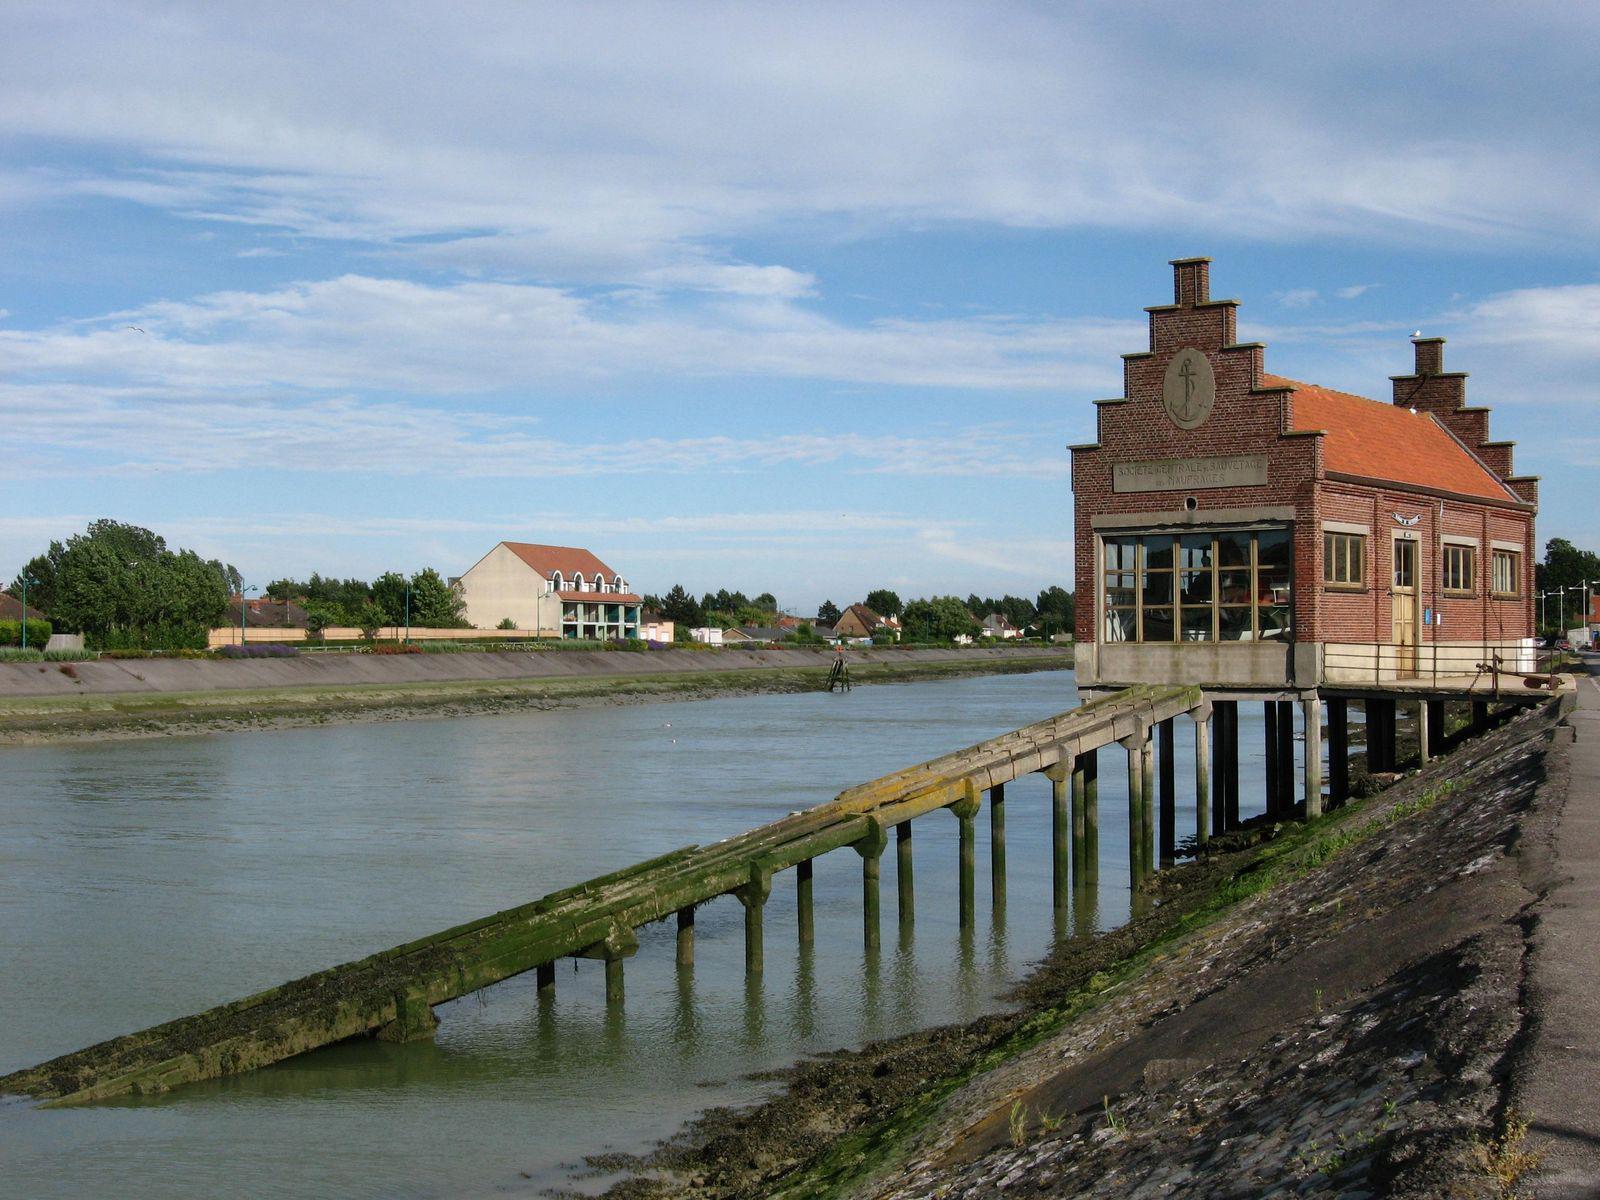 Maison du sauvetage_Grand-Fort-Philippe